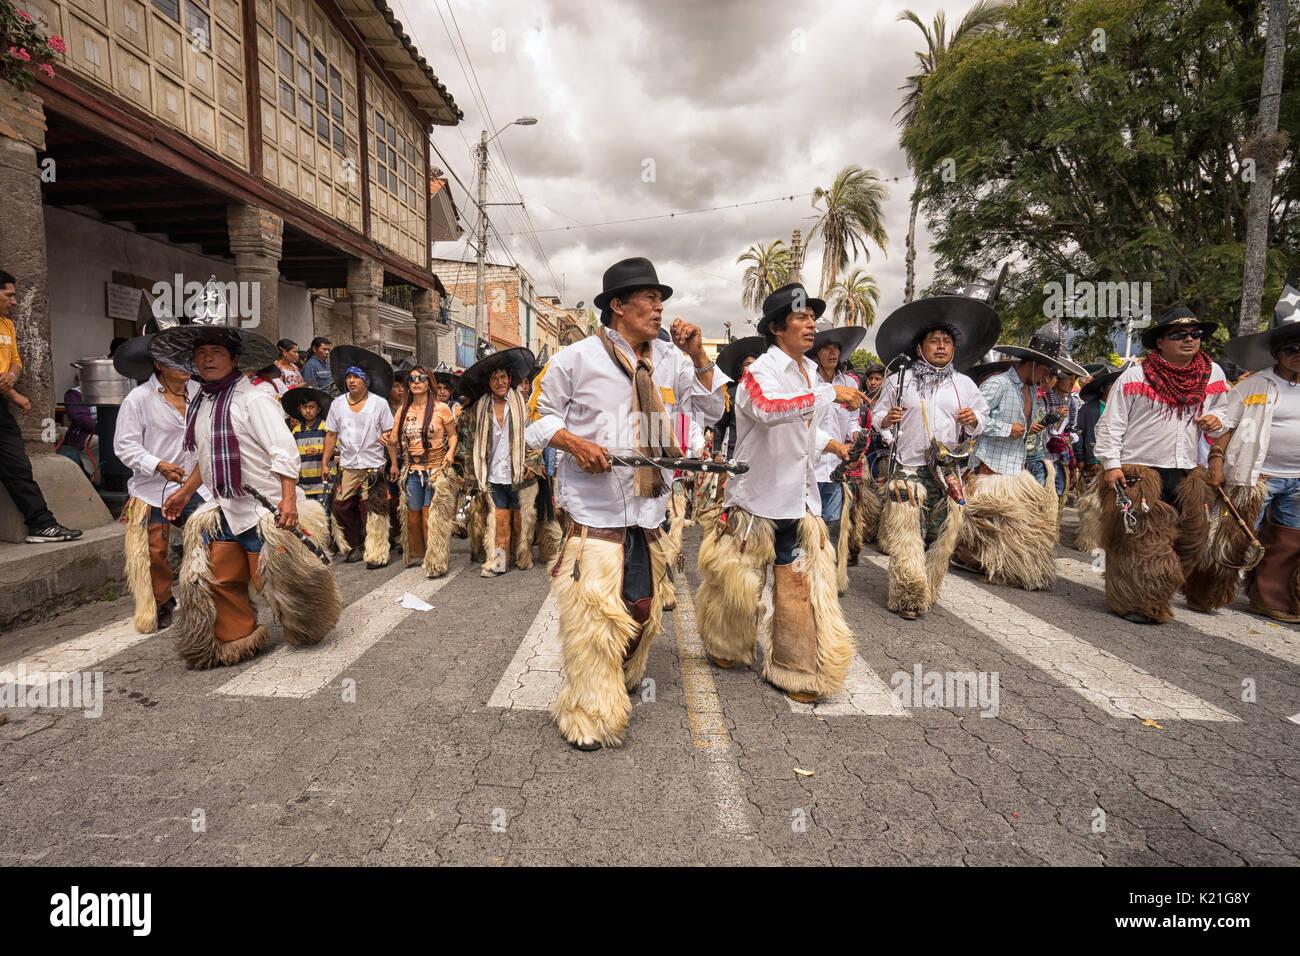 June 24, 2017 Cotacachi, Ecuador:  indigenous kichwa men wearing chaps dancing at the Inti Raymi parade at summer solstice - Stock Image